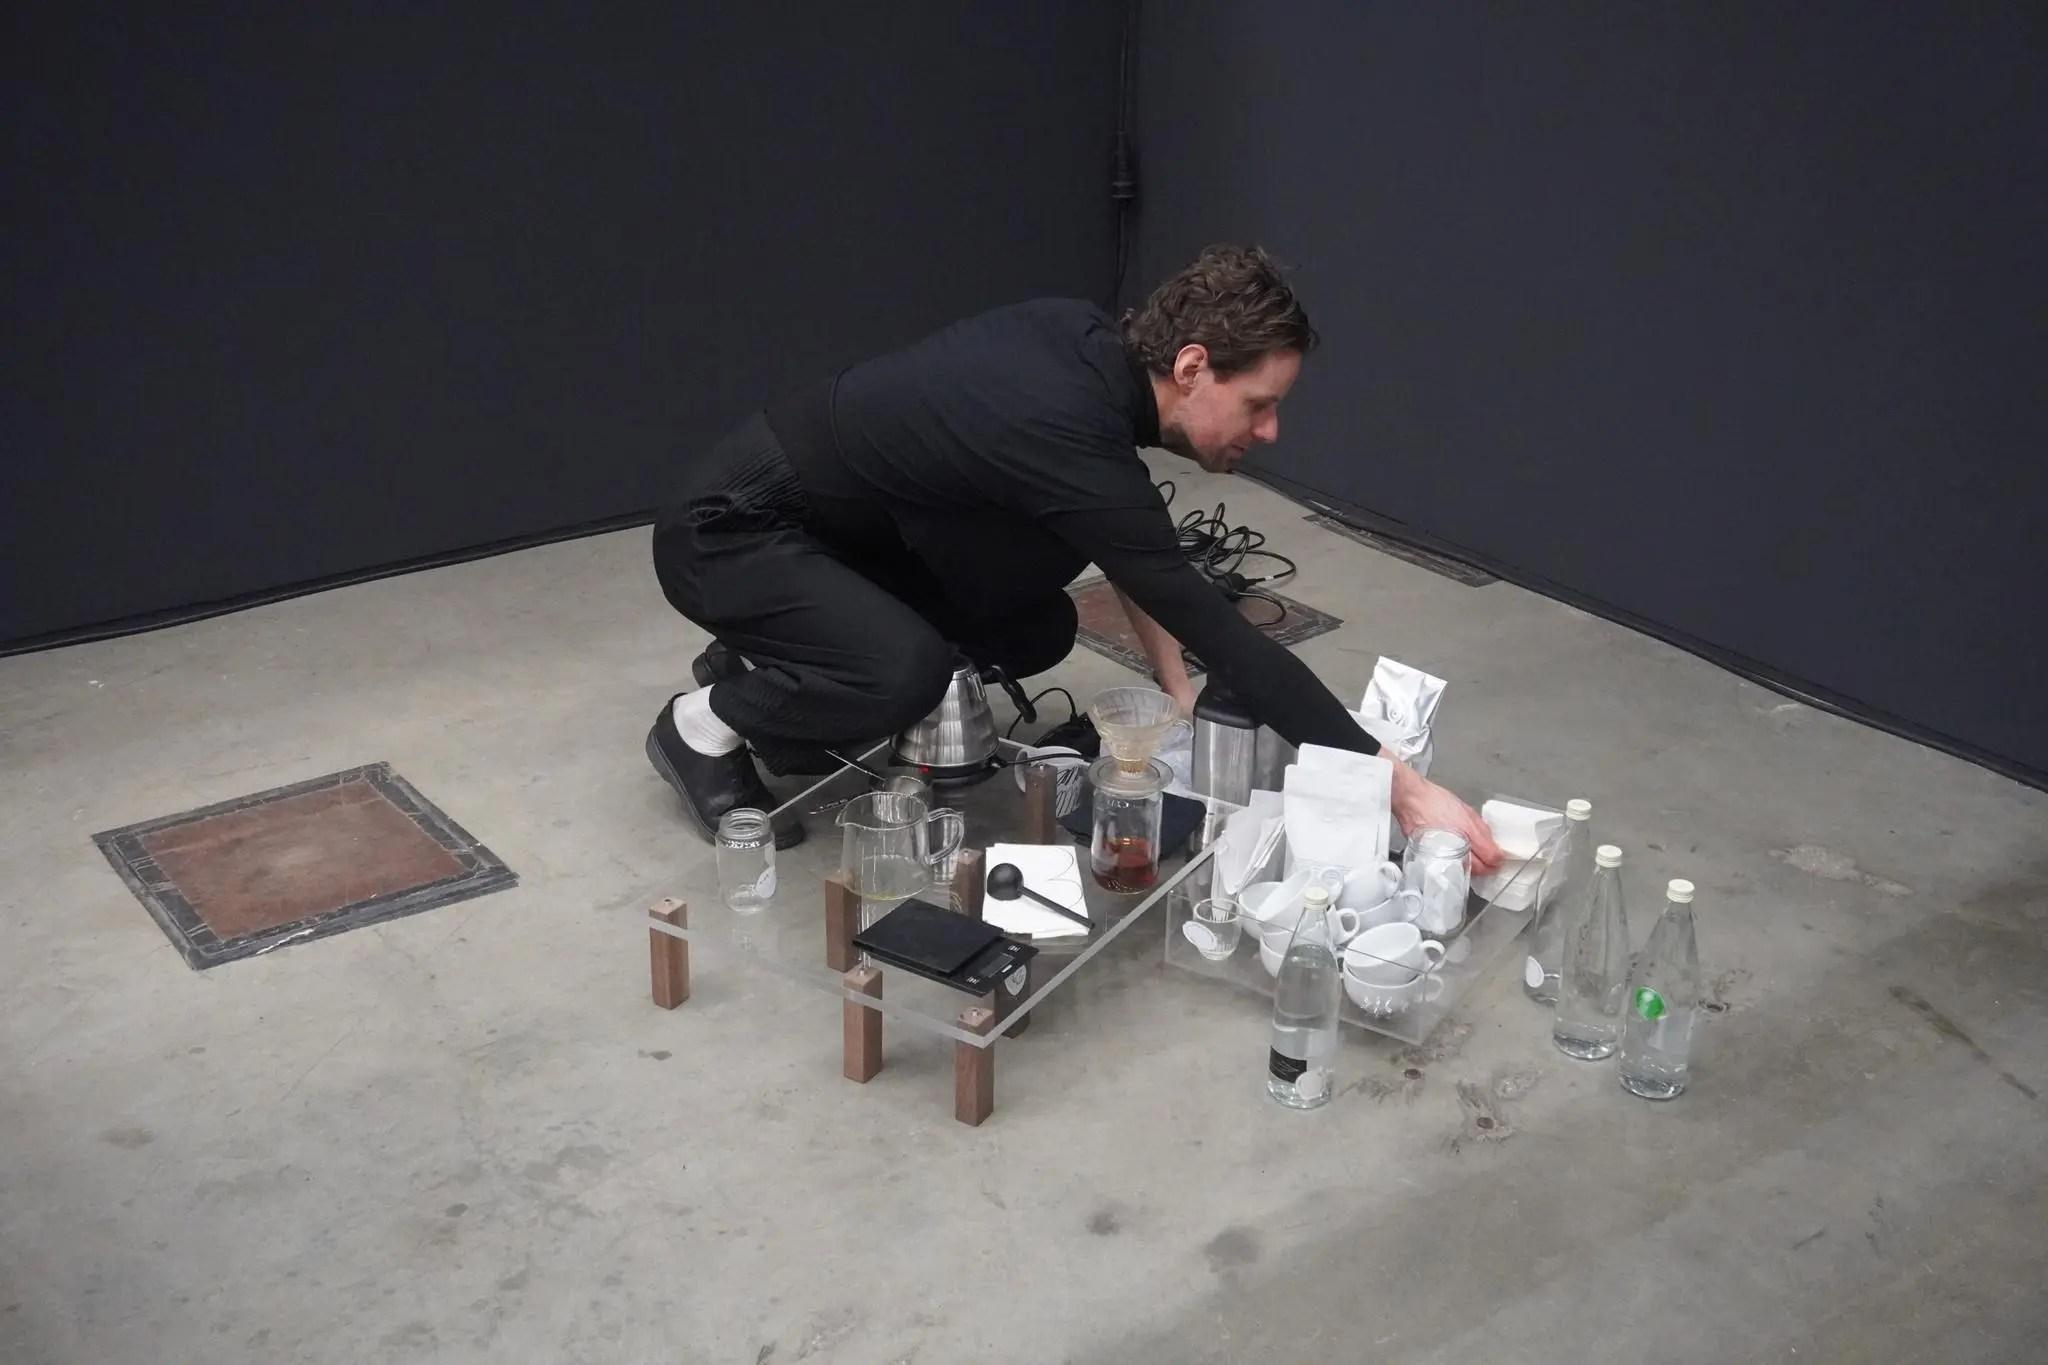 Tim Hollander